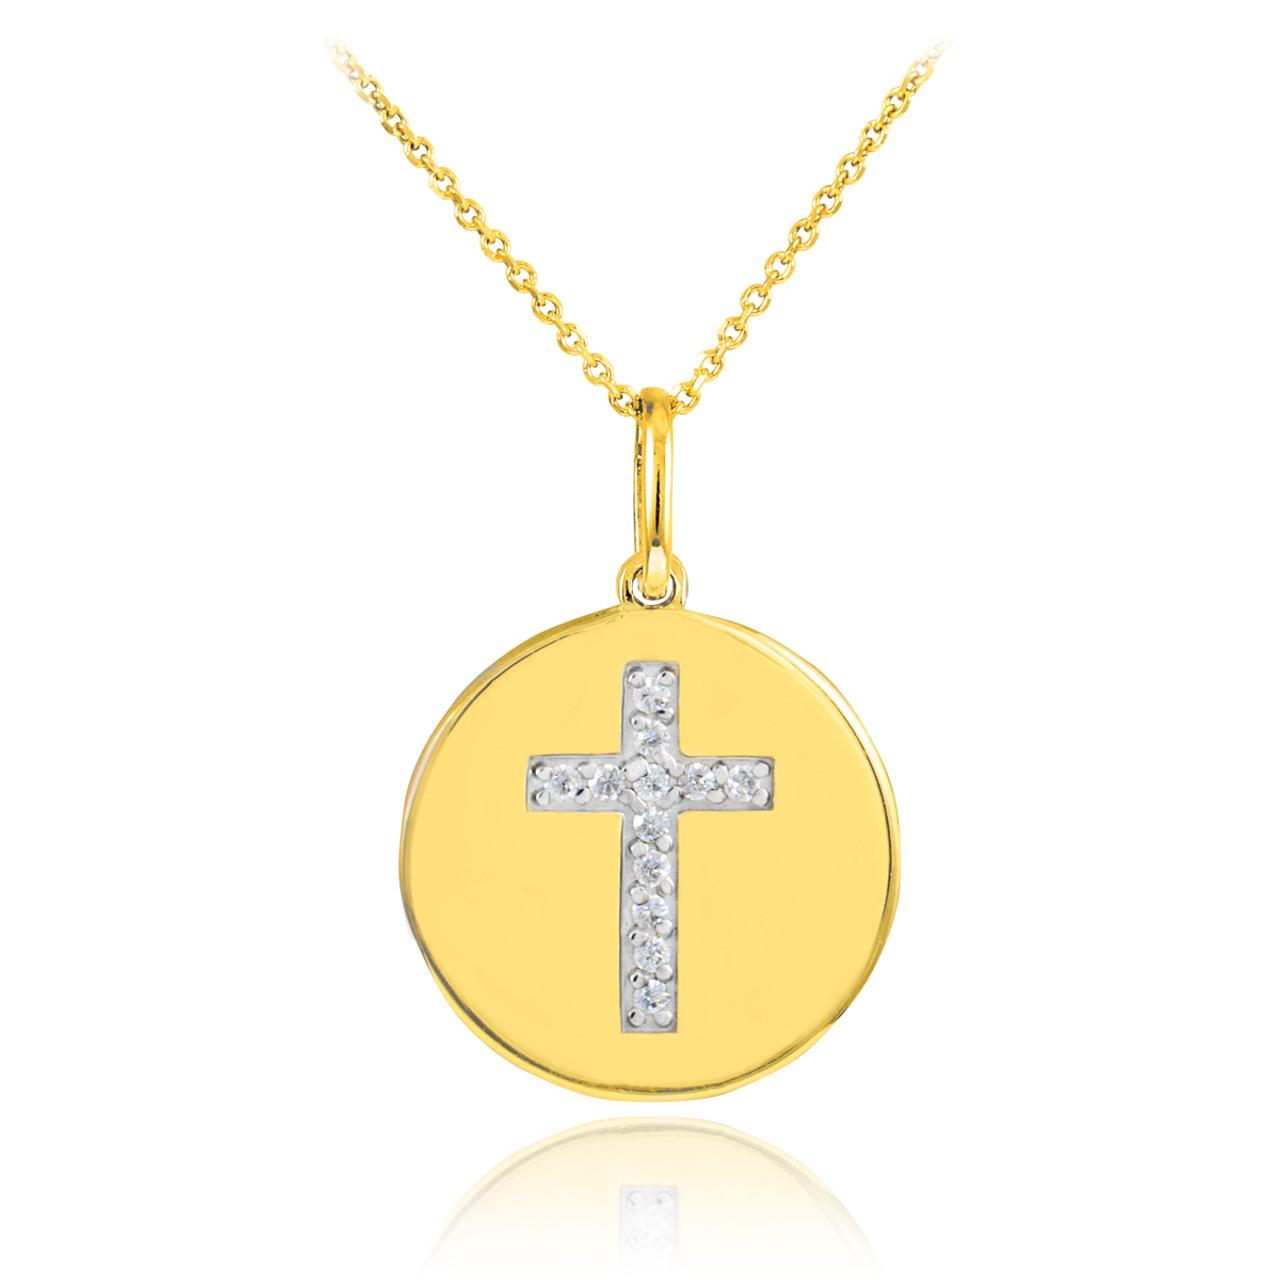 Disc pendant necklace cross disc pendant necklace diamond disc cross disc pendant necklace with diamonds in 14k gold aloadofball Choice Image